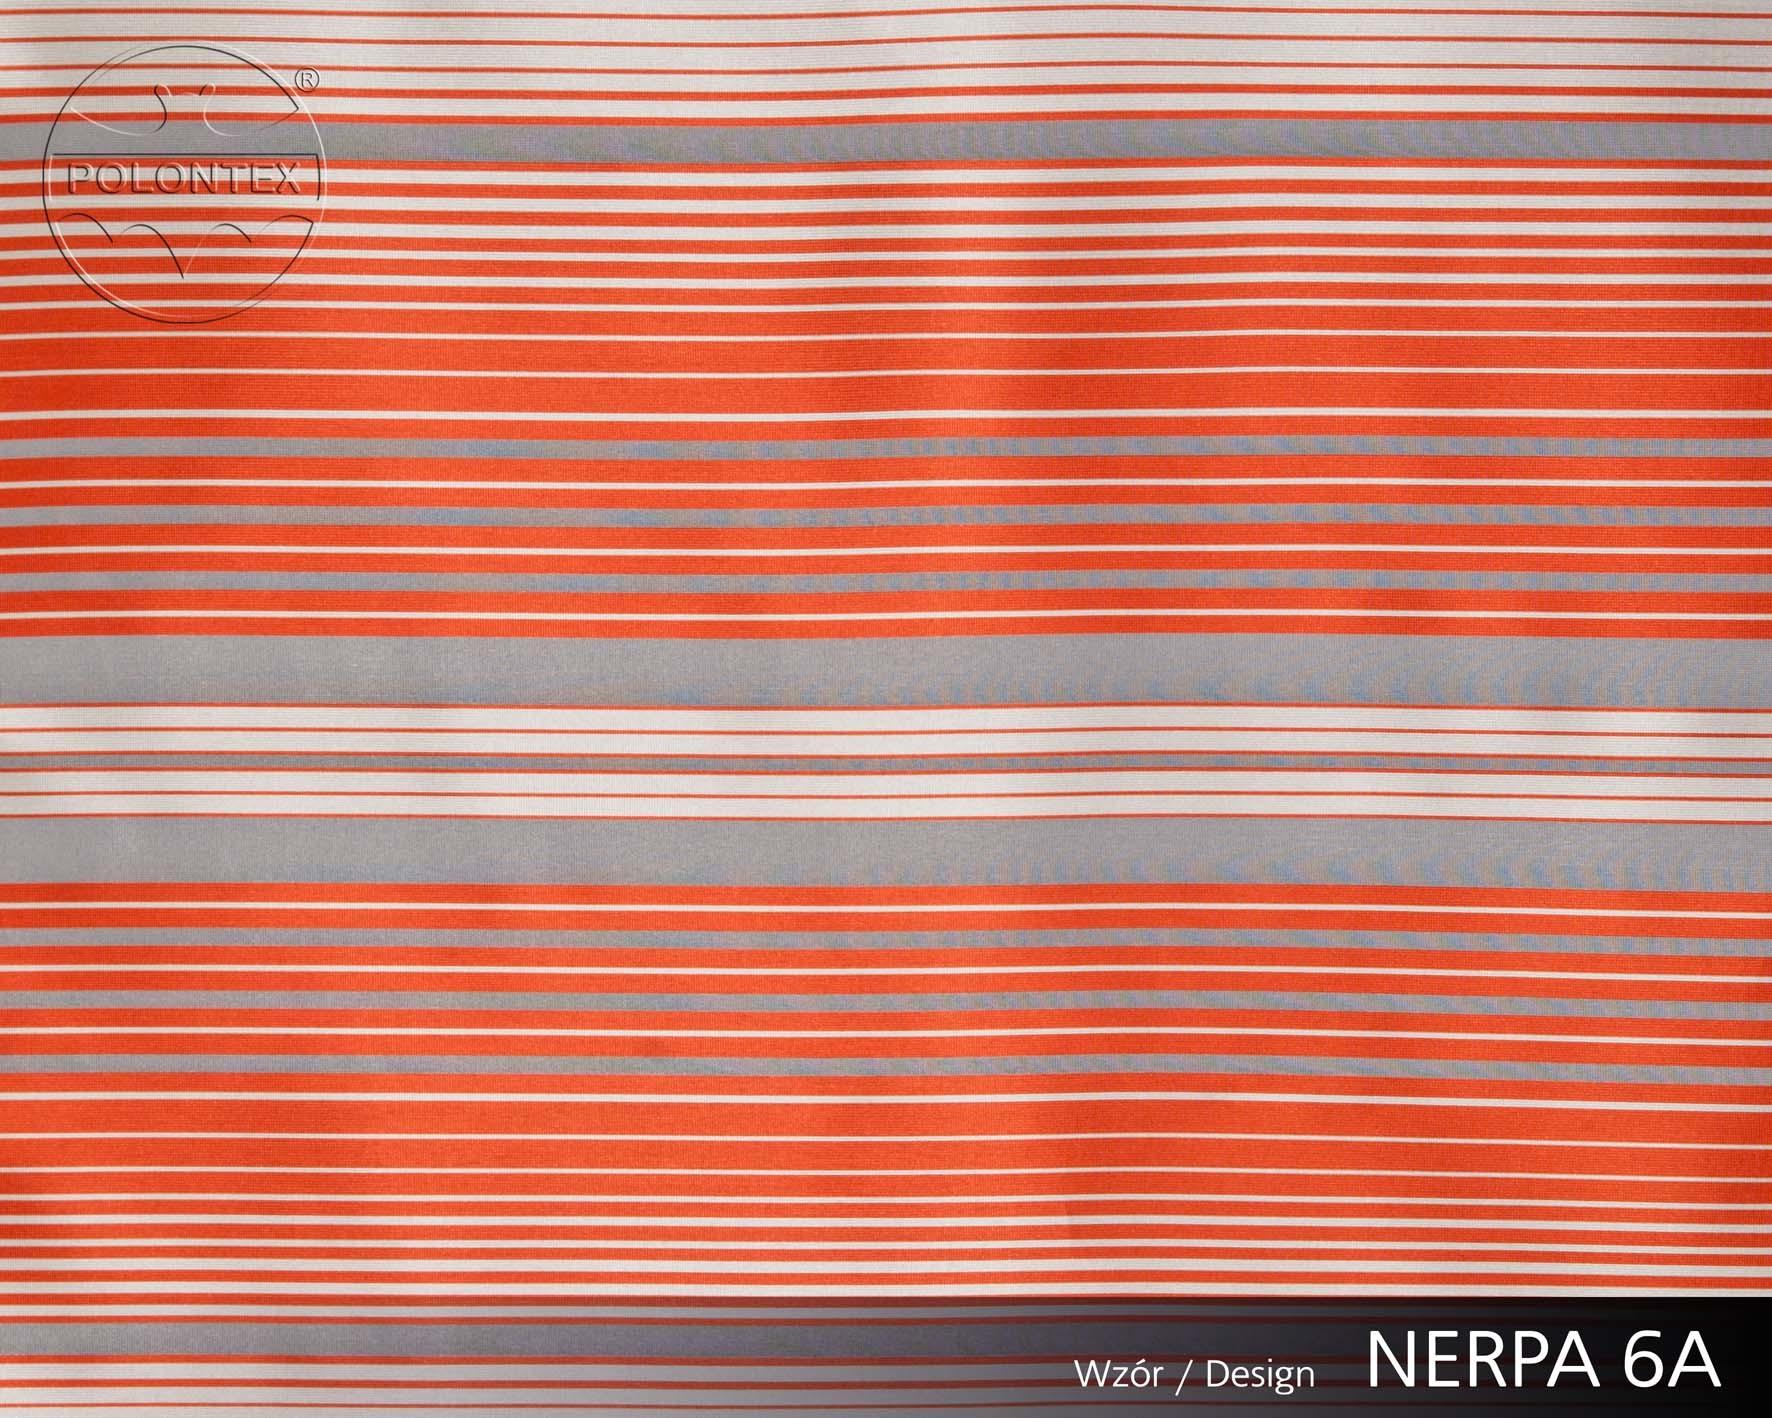 NERPA A257